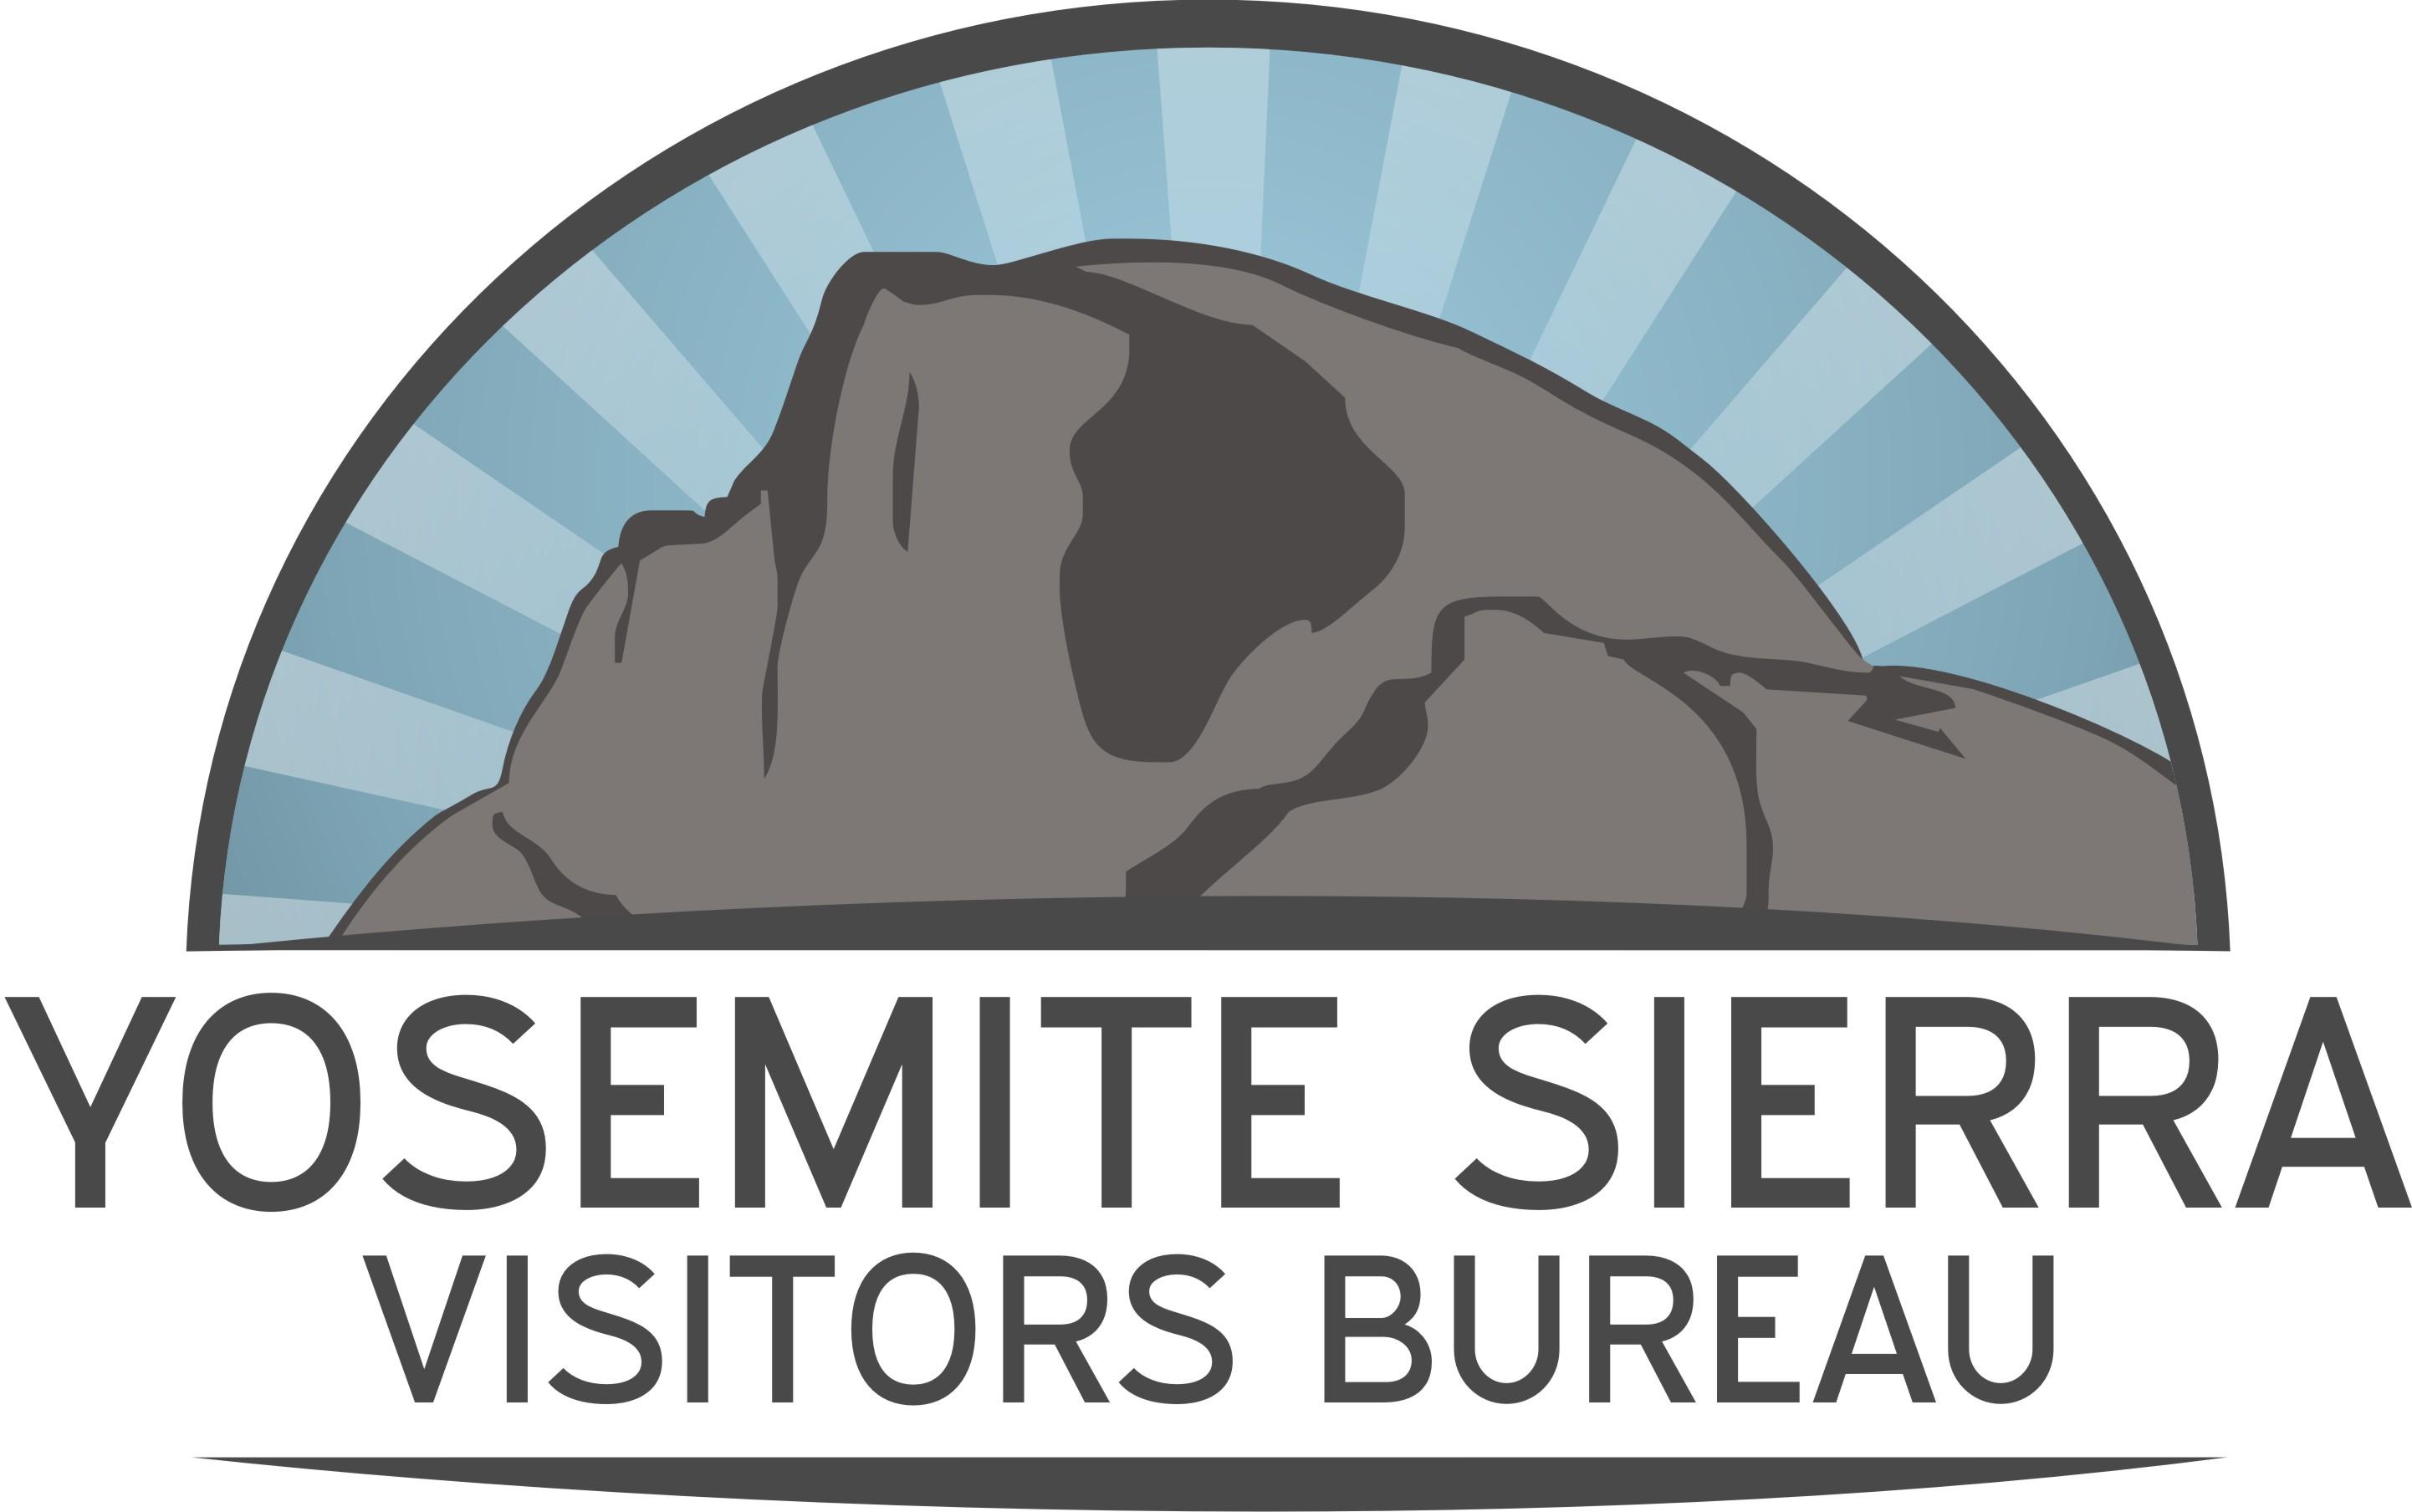 Yosemite Festival Honoring the 150th Anniversary of the Yosemite.